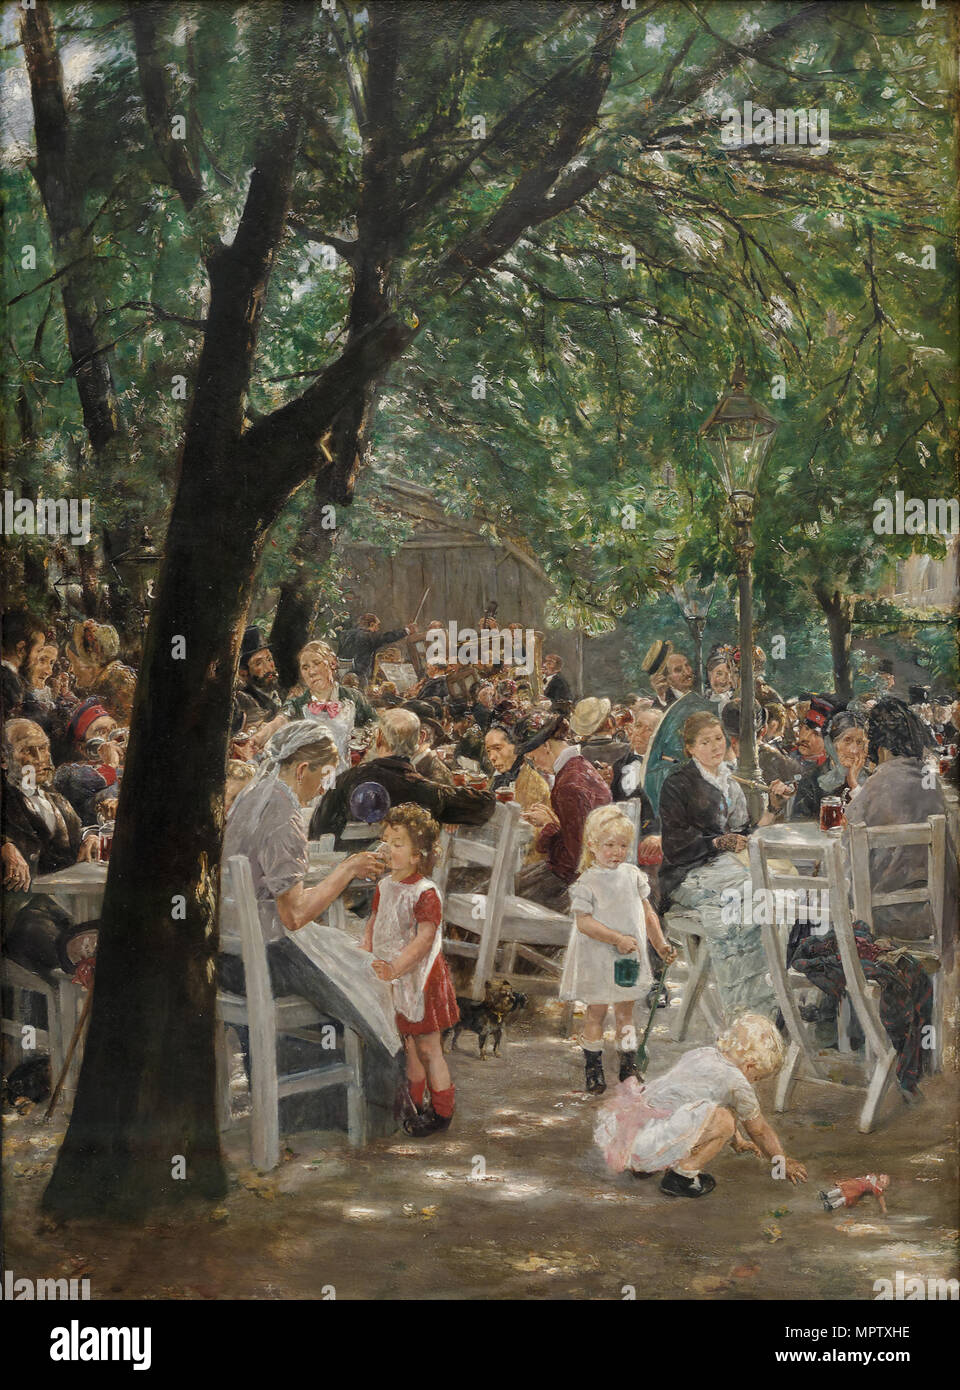 Munich beer garden. - Stock Image